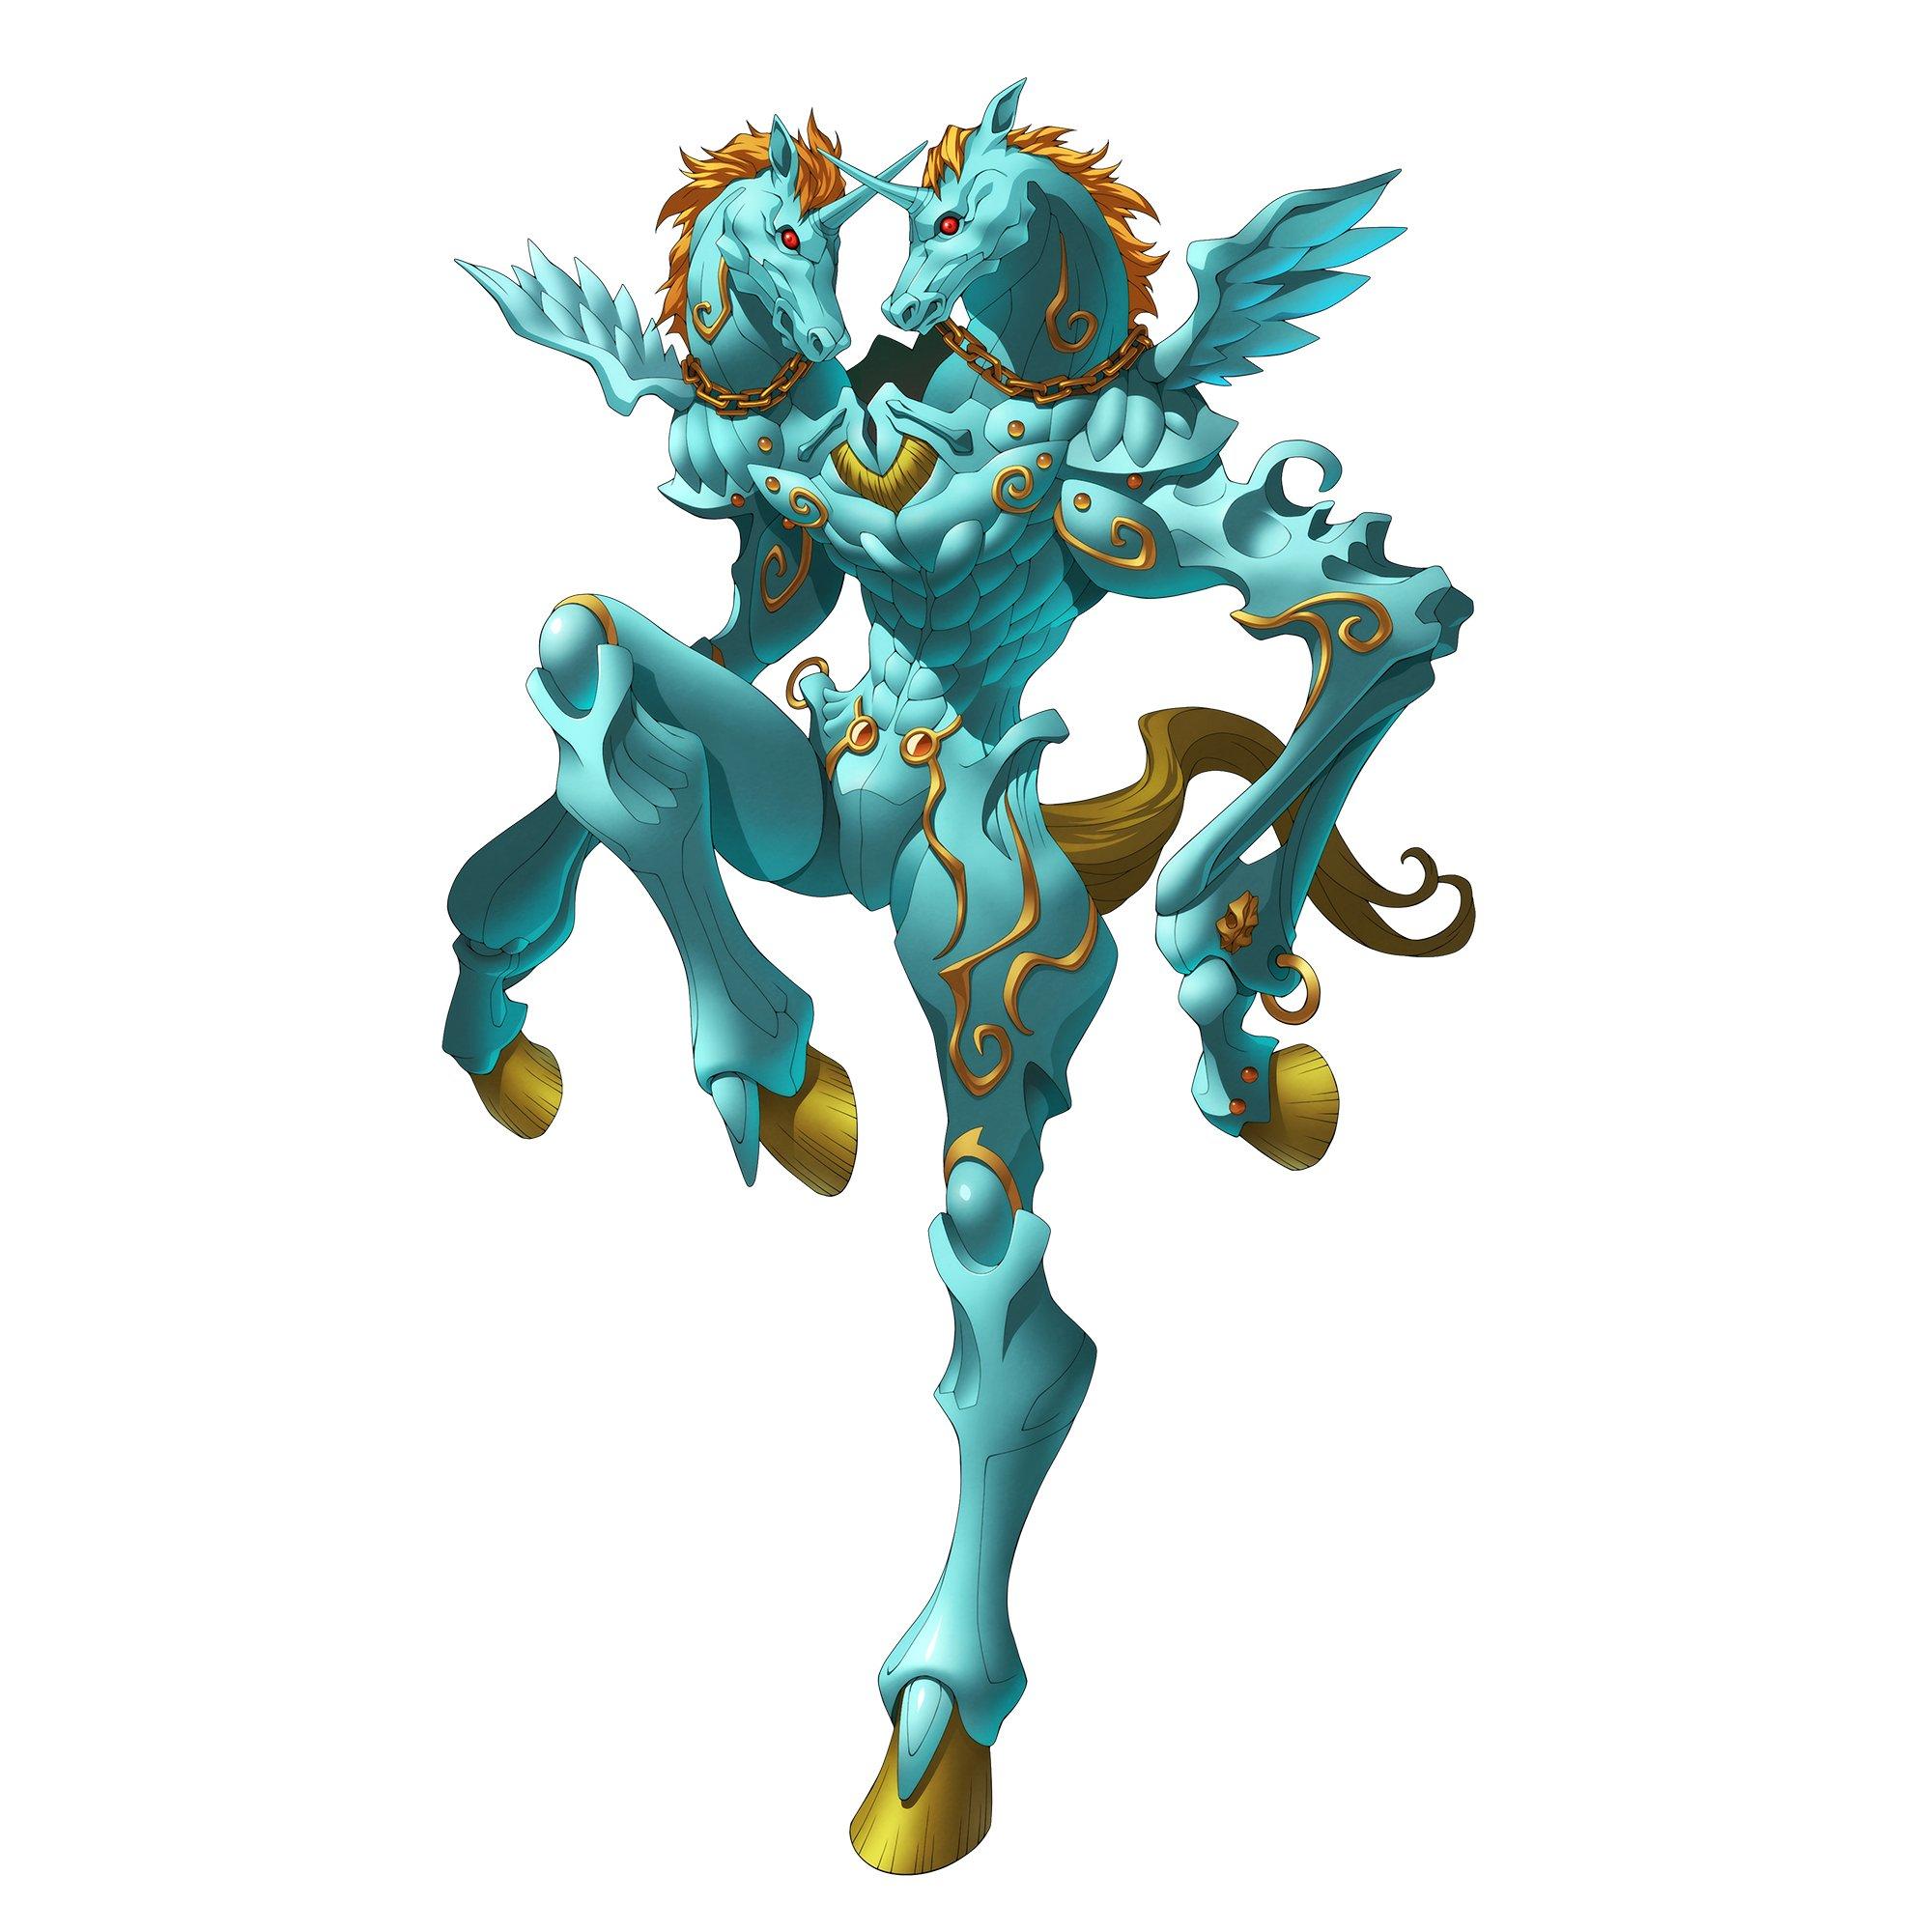 Centaur | Megami Tensei Wiki | Fandom